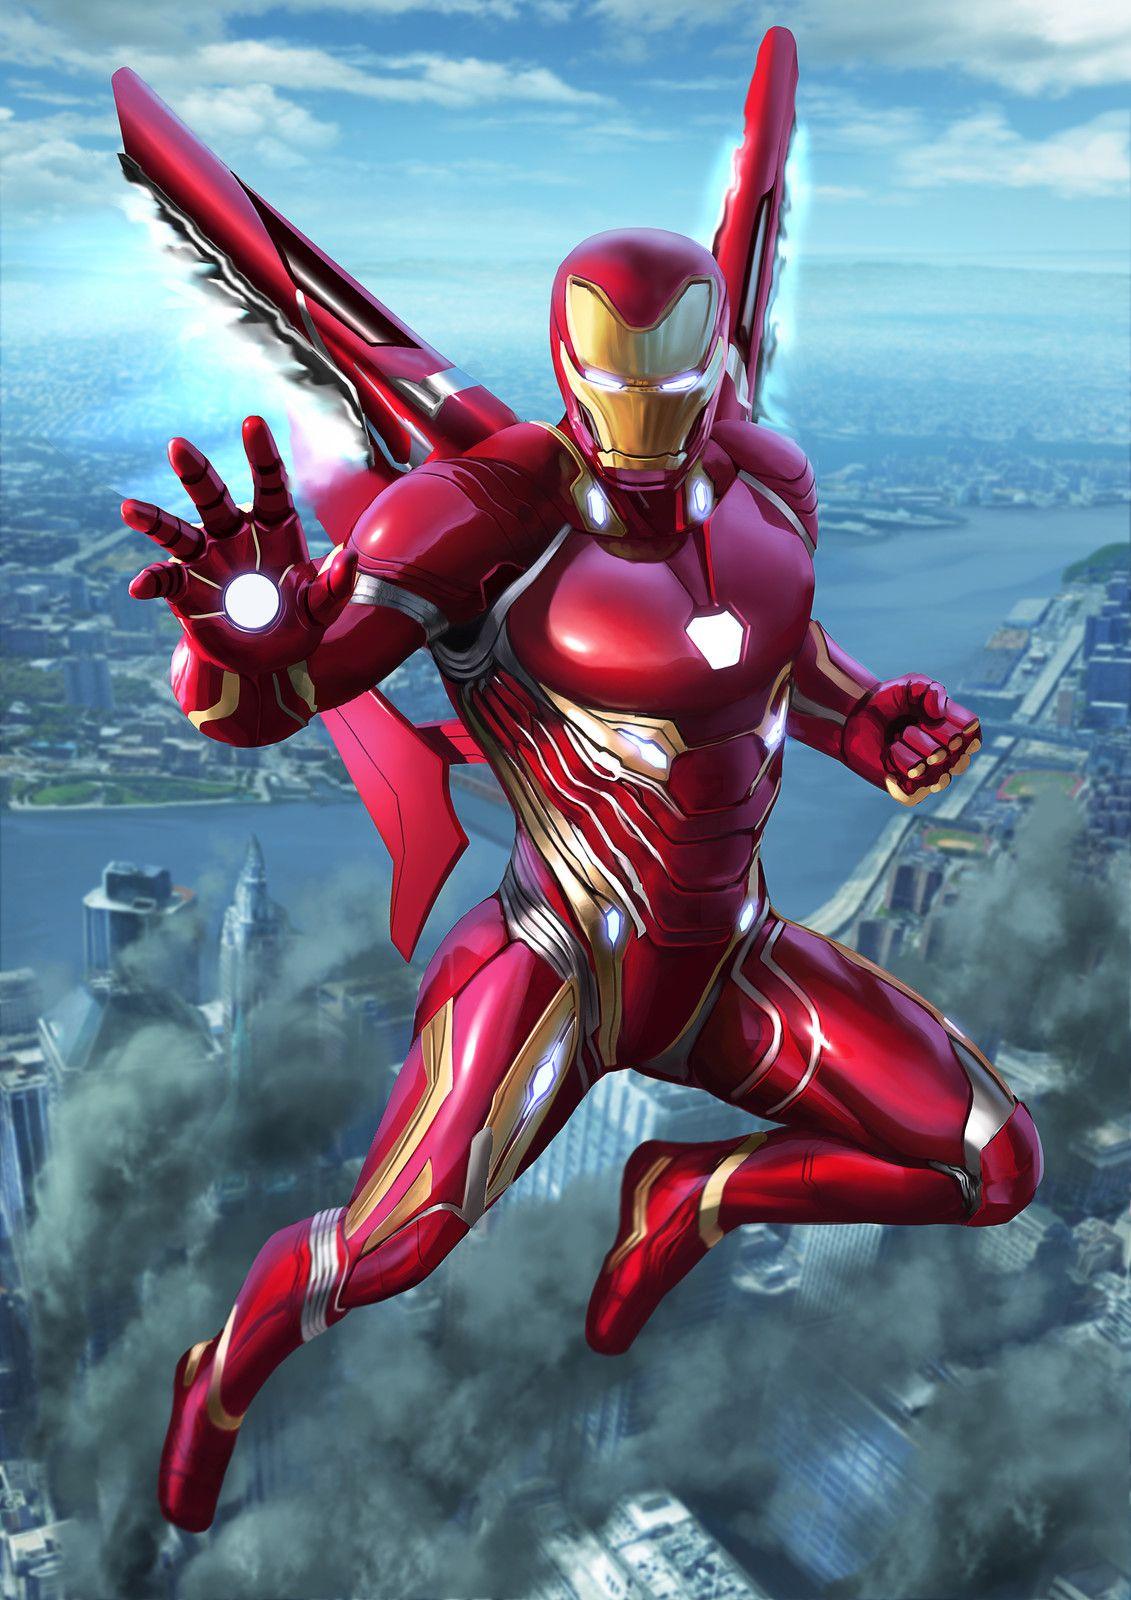 Iron Man Infinity War by Chris Koh on ArtStation Marvel